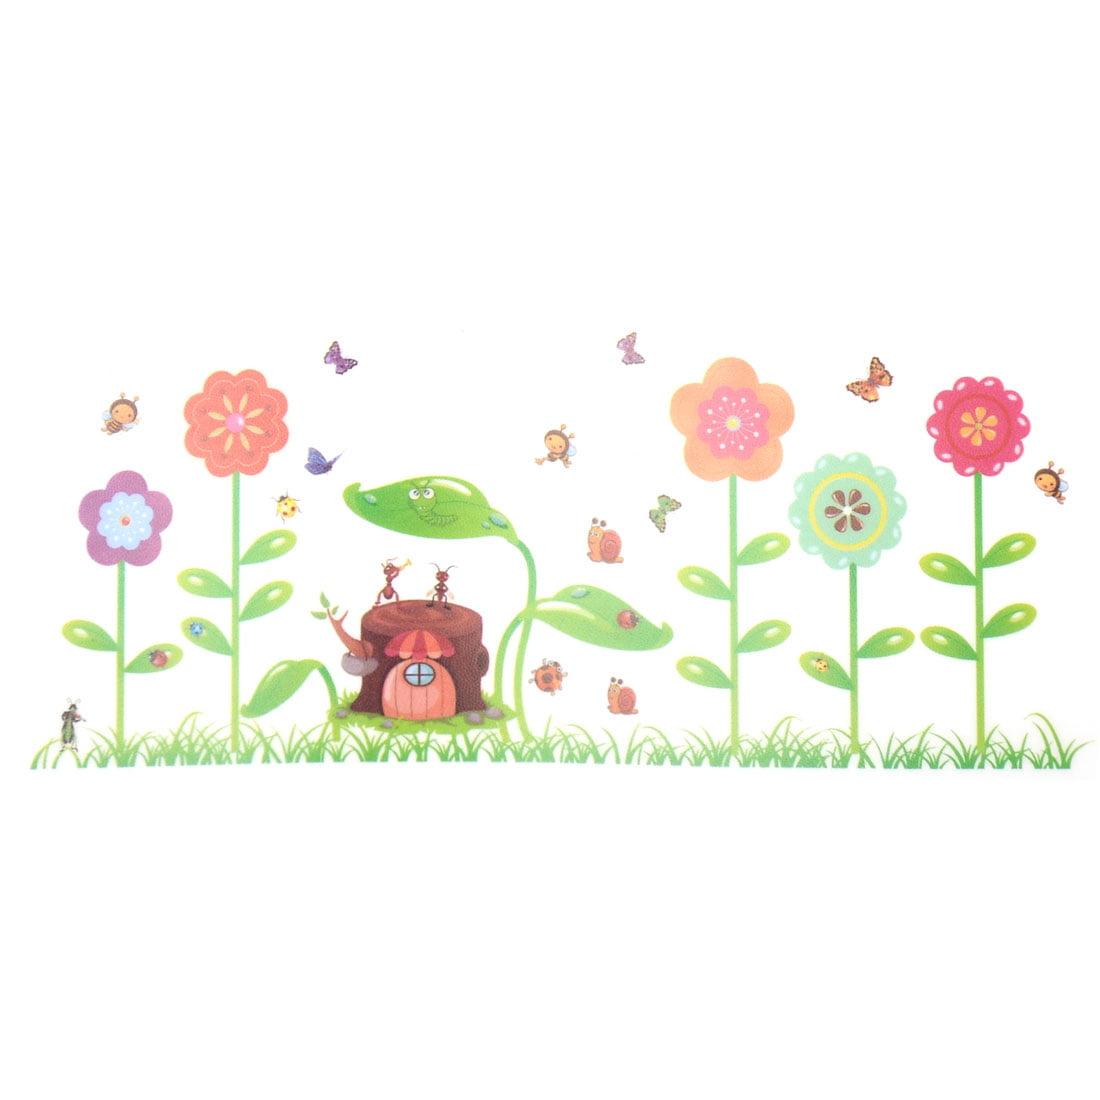 Flower Stump Print Water Resistant Adhesive Wall Sticker Decal Mural 70 x 50cm - image 5 de 5